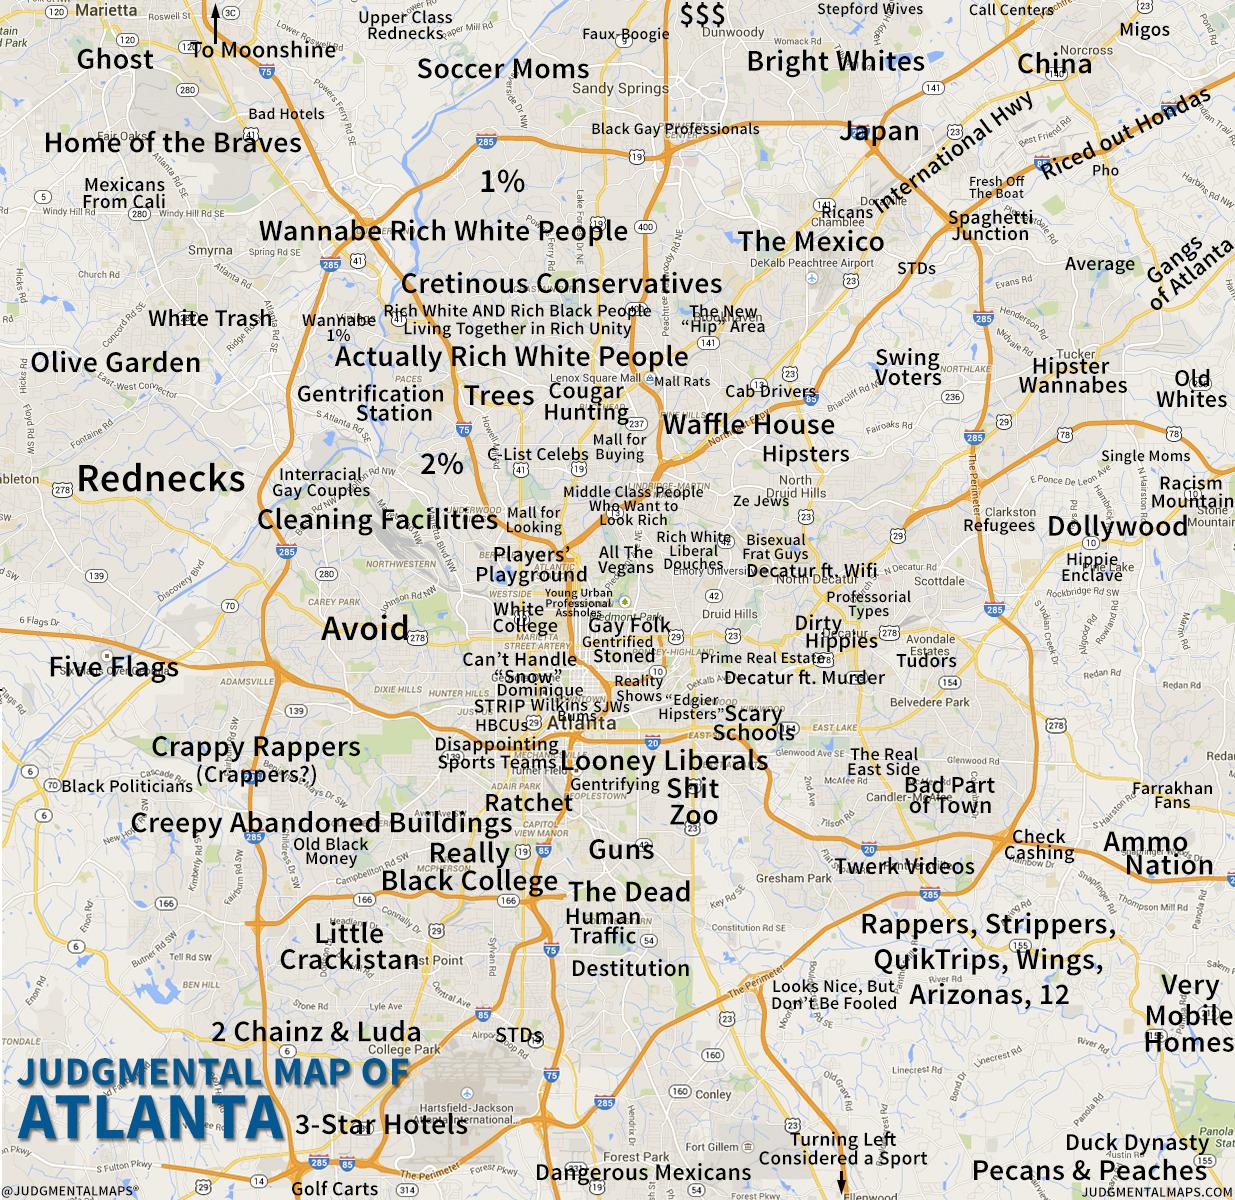 City Map Of Atlanta Georgia.6 Funny Maps Of Georgia